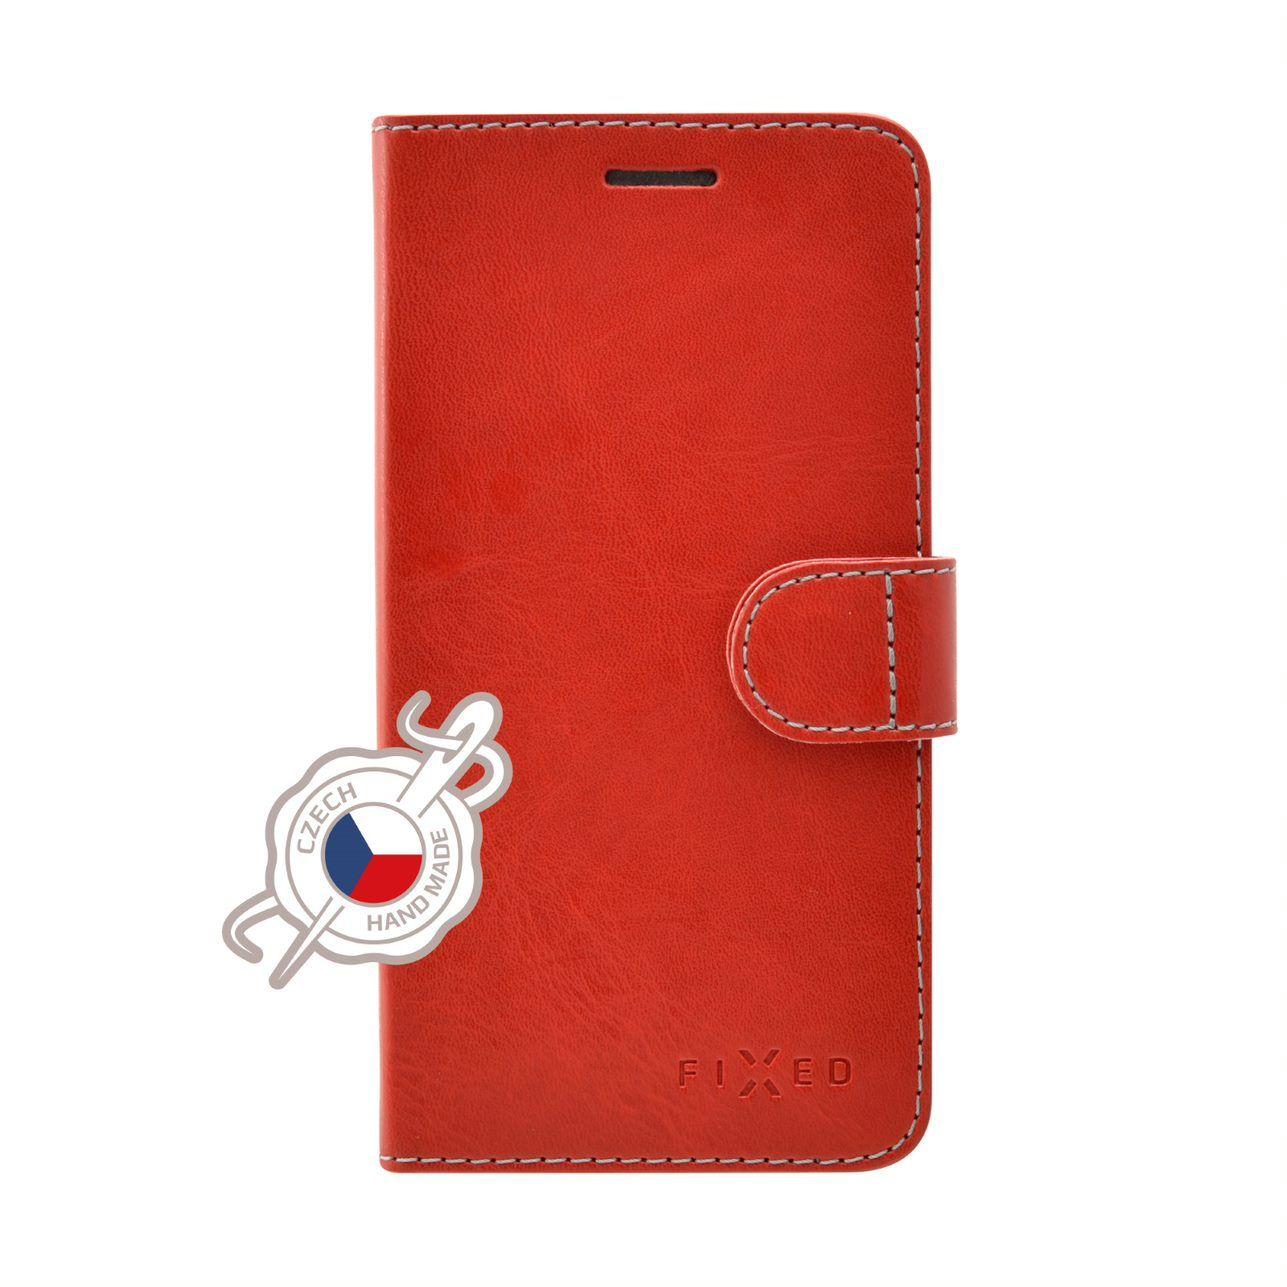 FIXED FIT flipové pouzdro pro Xiaomi Redmi Note 6 Pro, červenéIT pro Xiaomi Redmi Note 6 Pro, červené